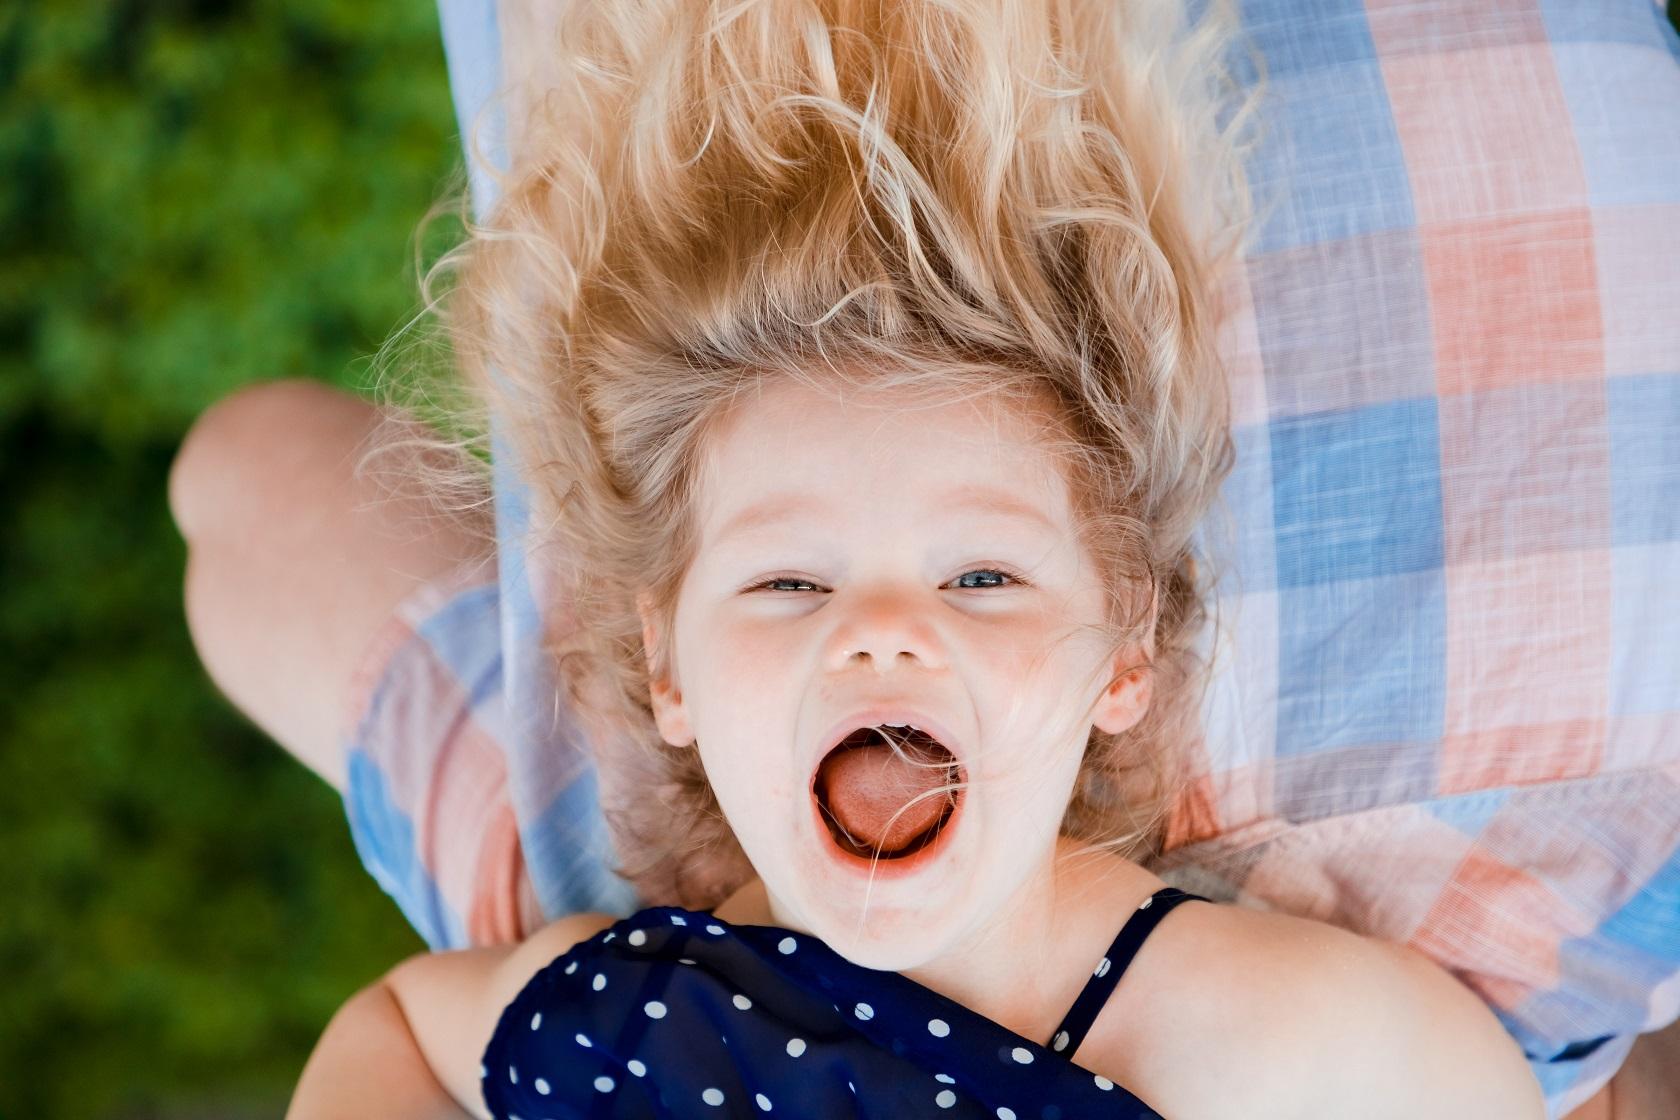 kid upside down laughing happy portrait